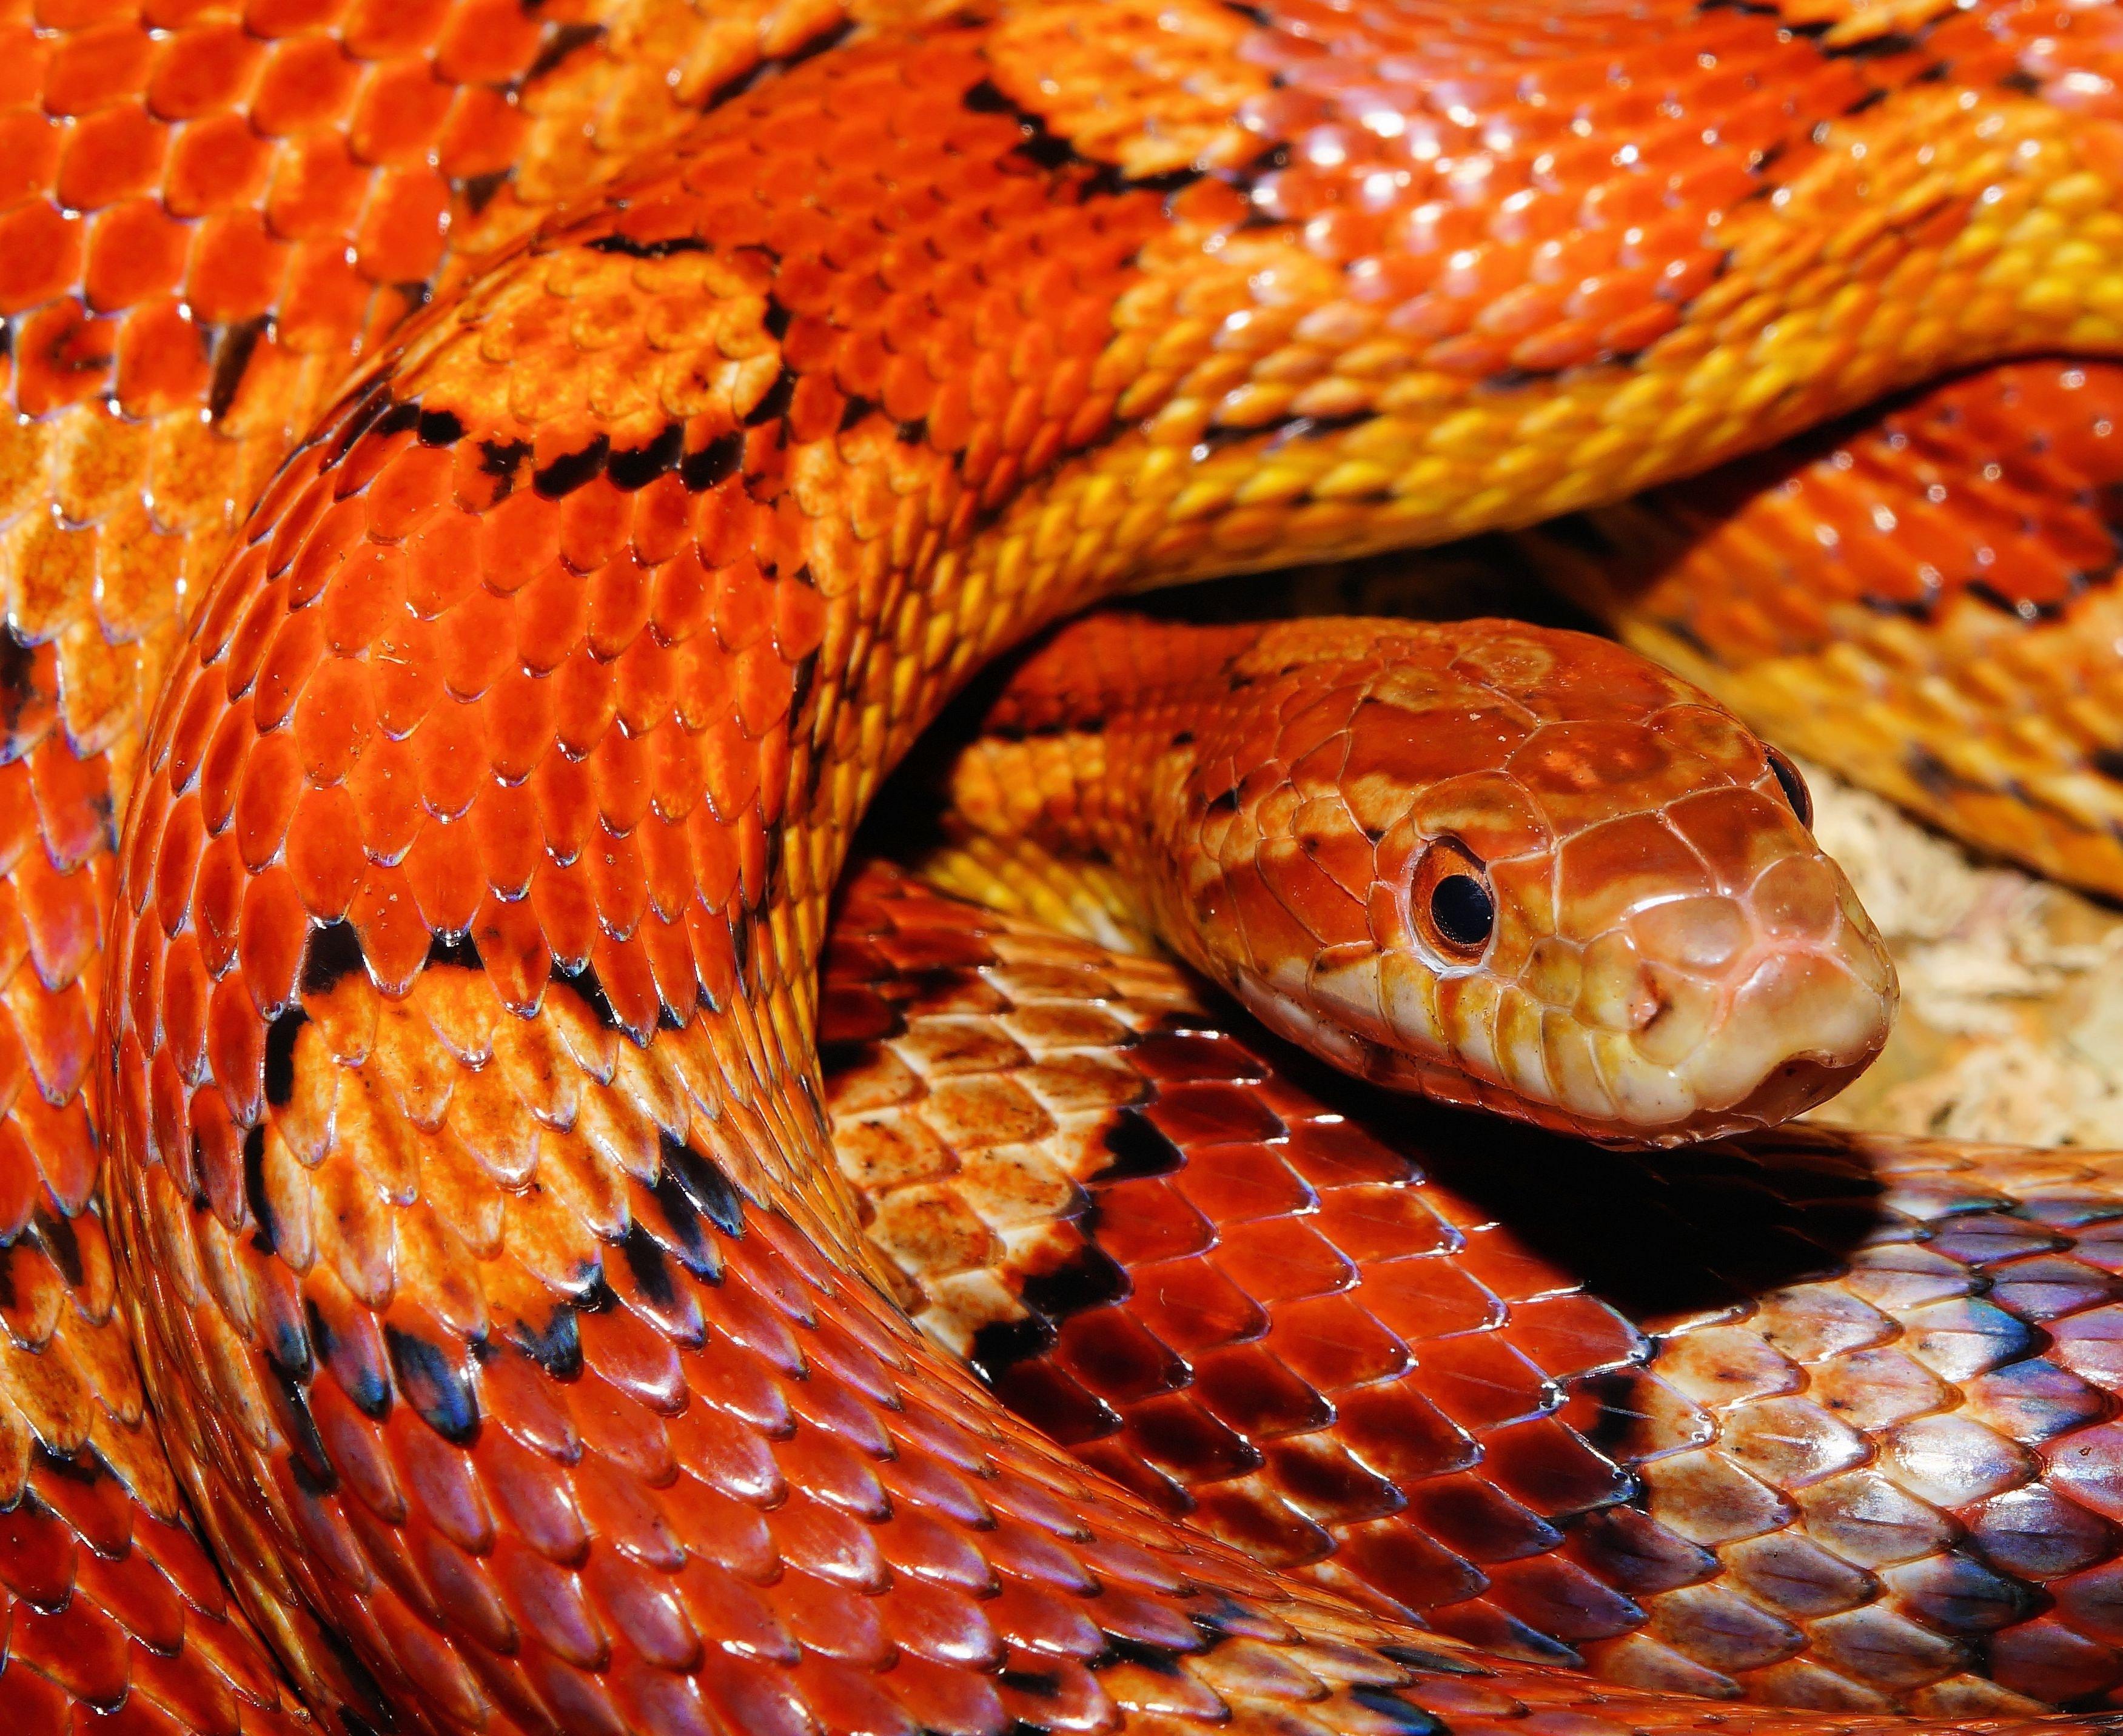 snake-corn-snake-reptile-scale-40787.jpeg?cs=srgb&dl=close-up-corn-snake-reptile-40787.jpg&fm=jpg